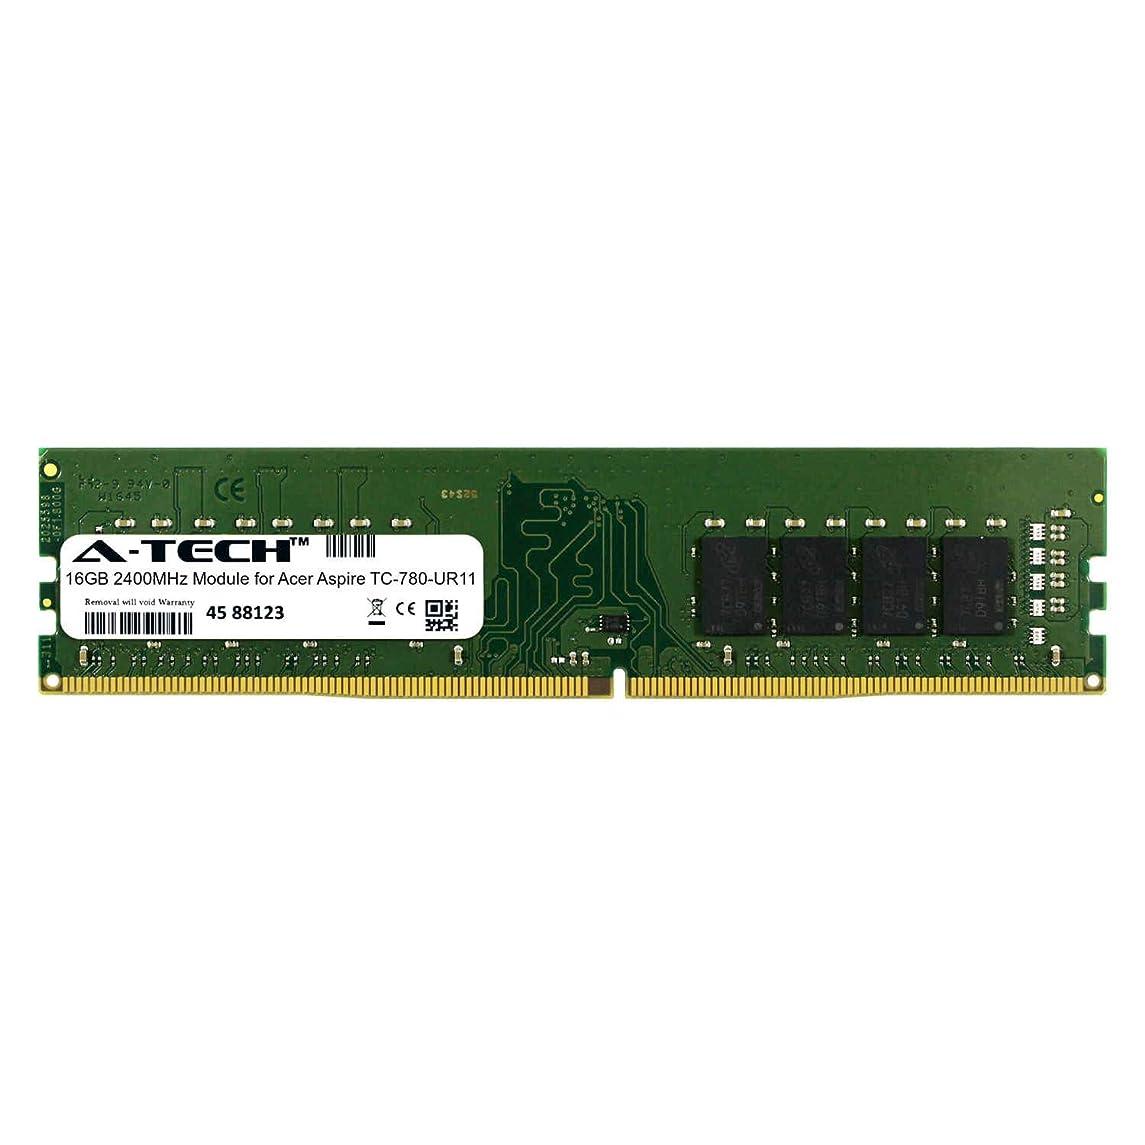 A-Tech 16GB Module for Acer Aspire TC-780-UR11 Desktop & Workstation Motherboard Compatible DDR4 2400Mhz Memory Ram (ATMS267407A25822X1)